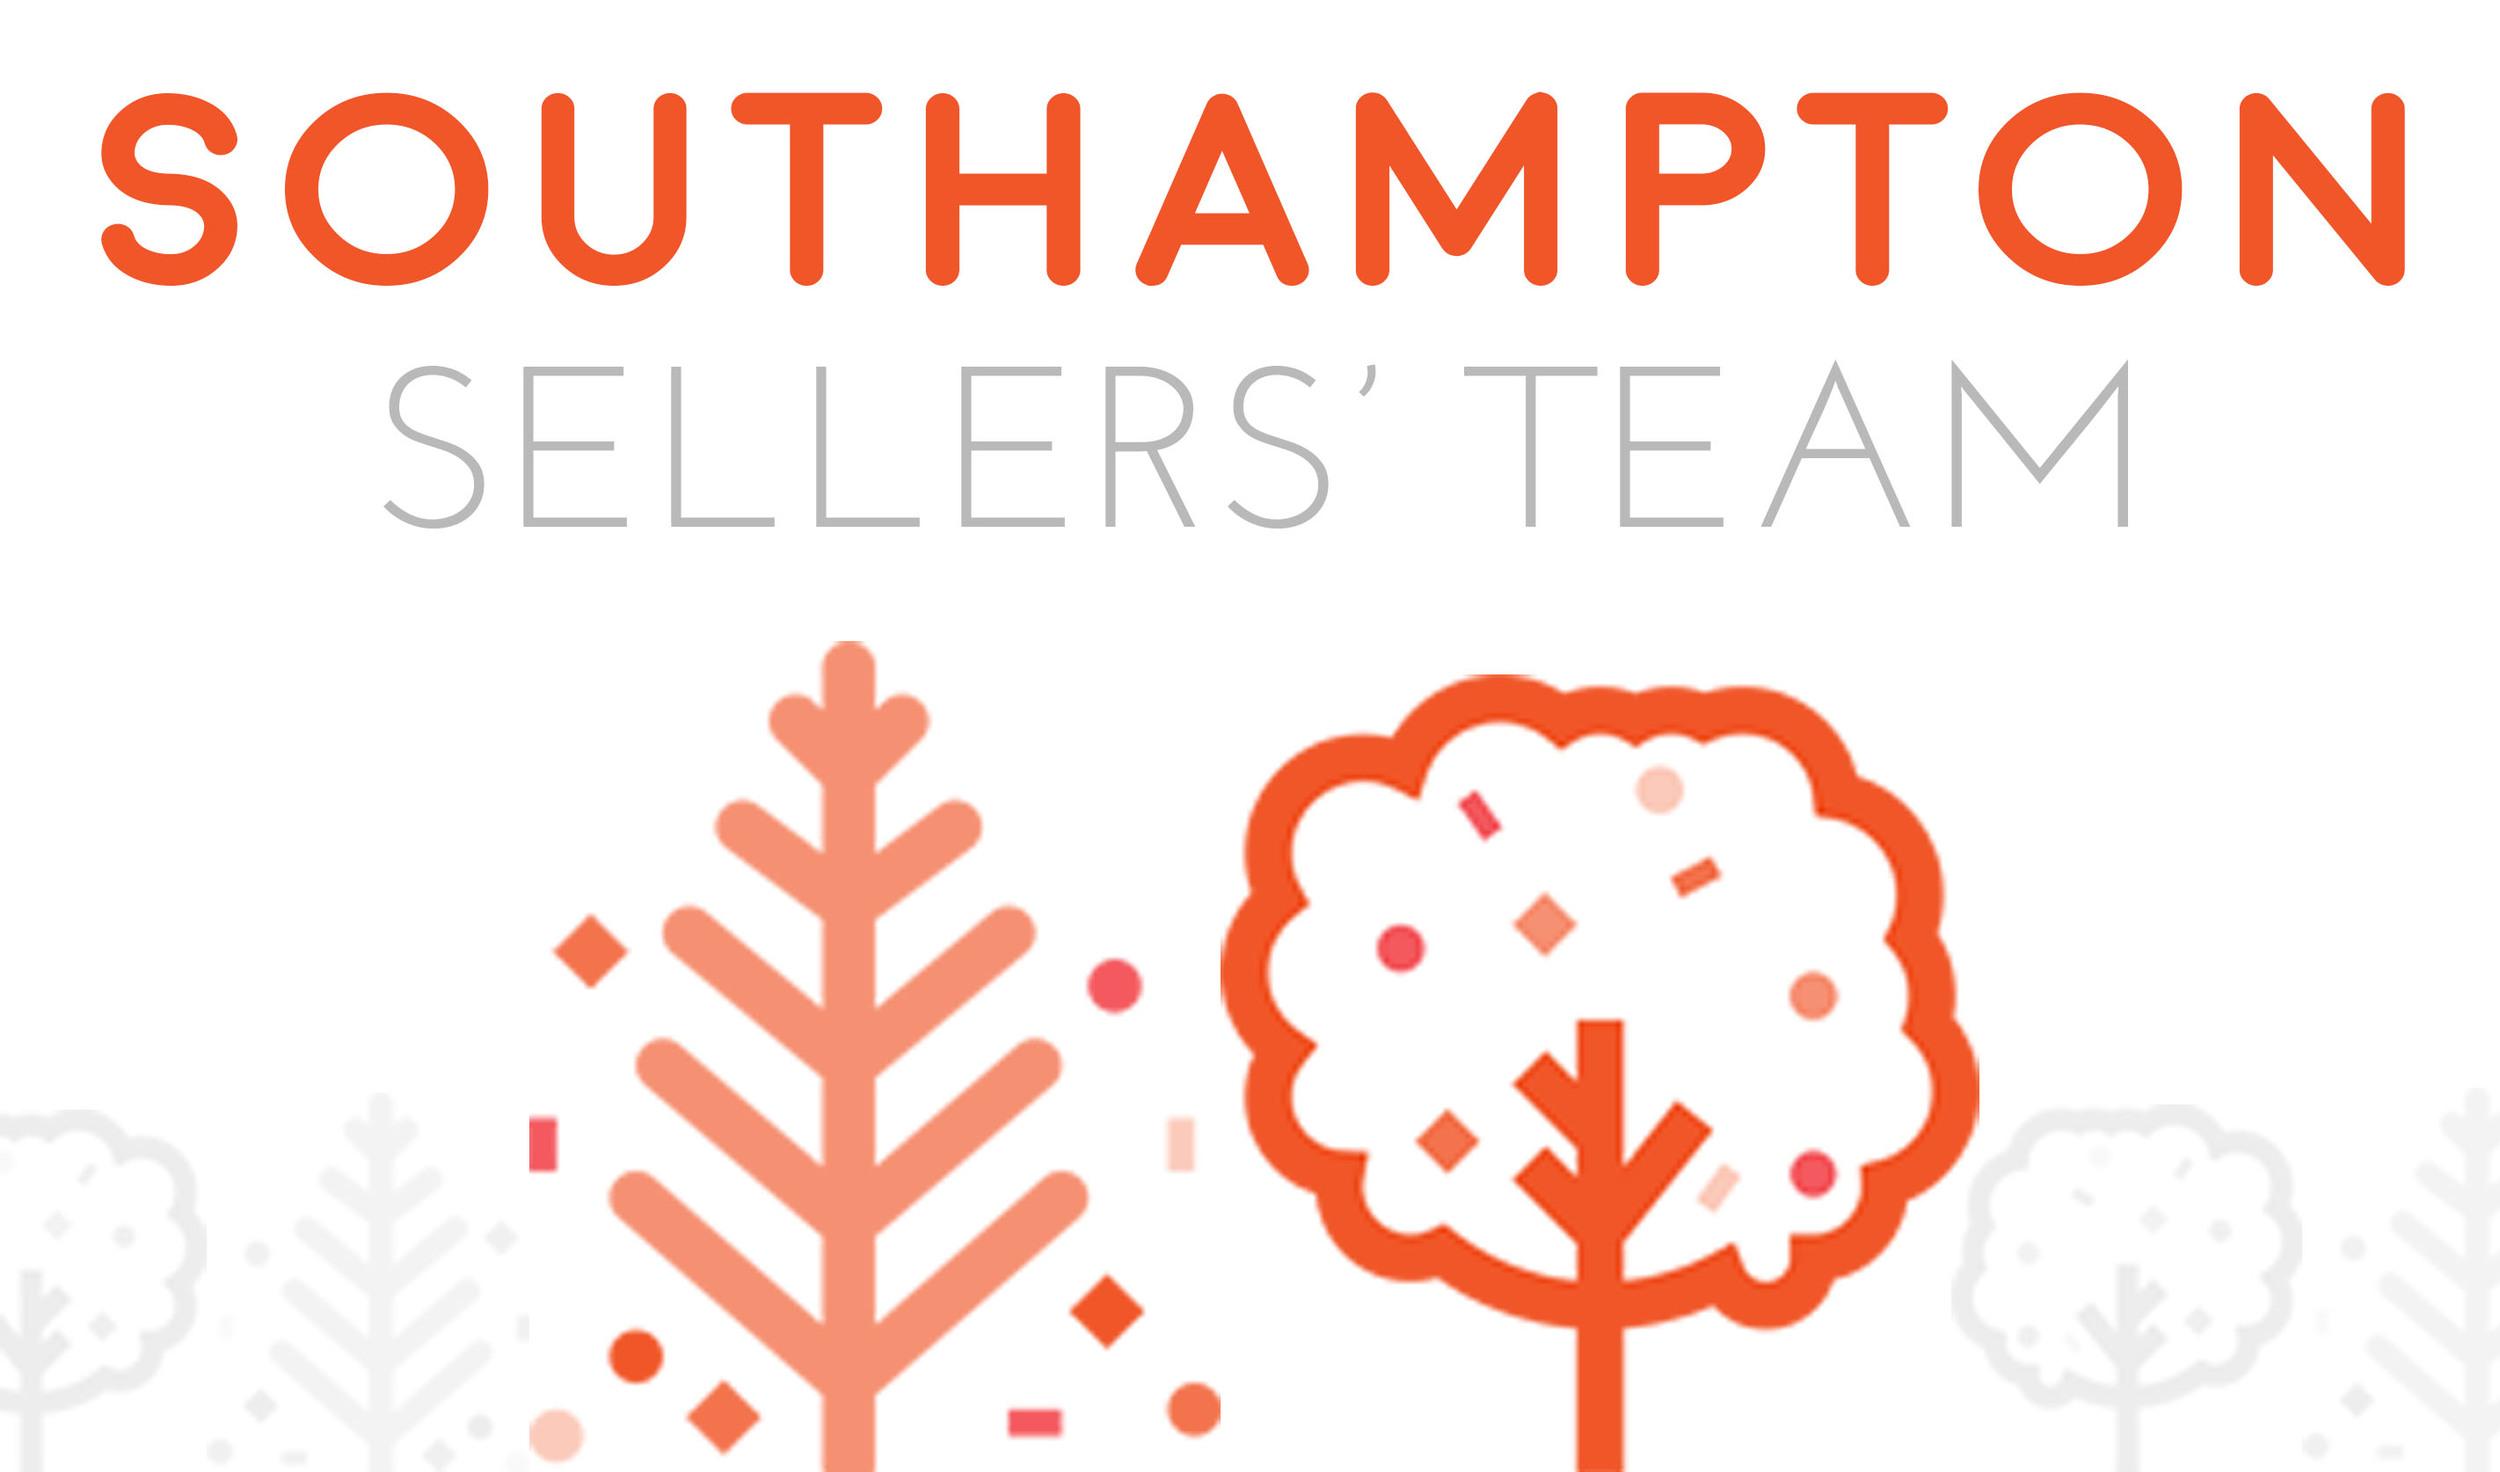 Southampton Etsy Sellers